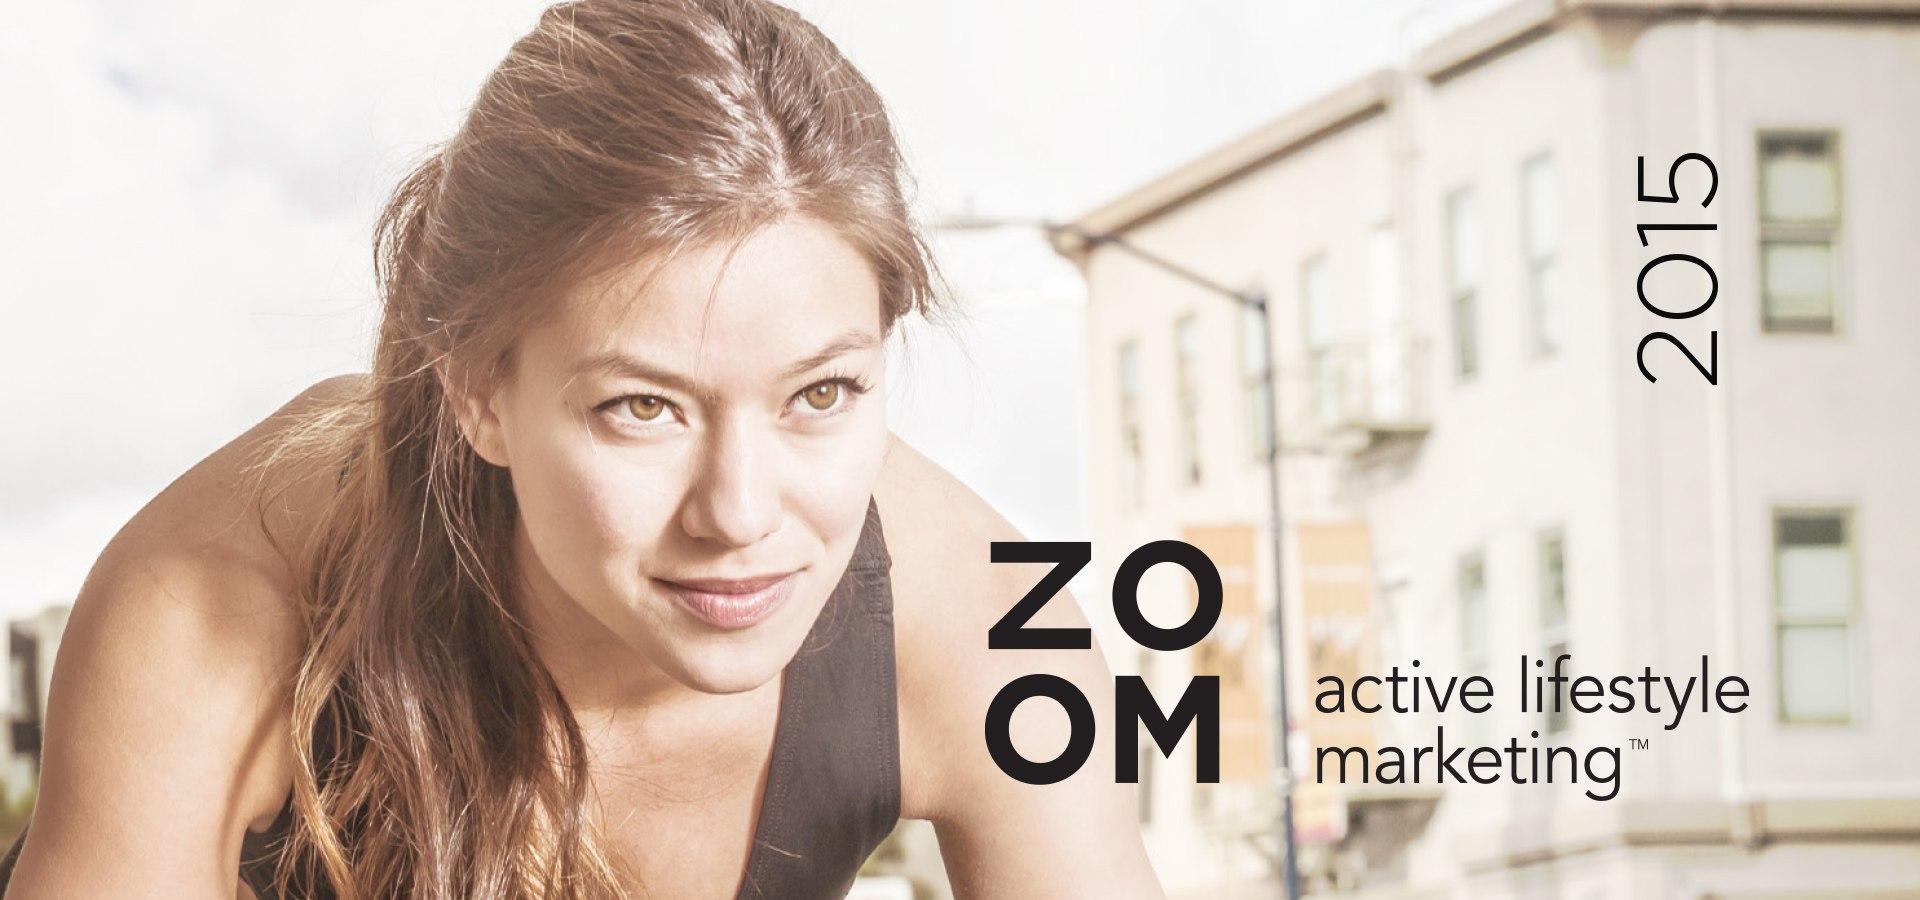 Zoom Media Cover Woman Logo 2015